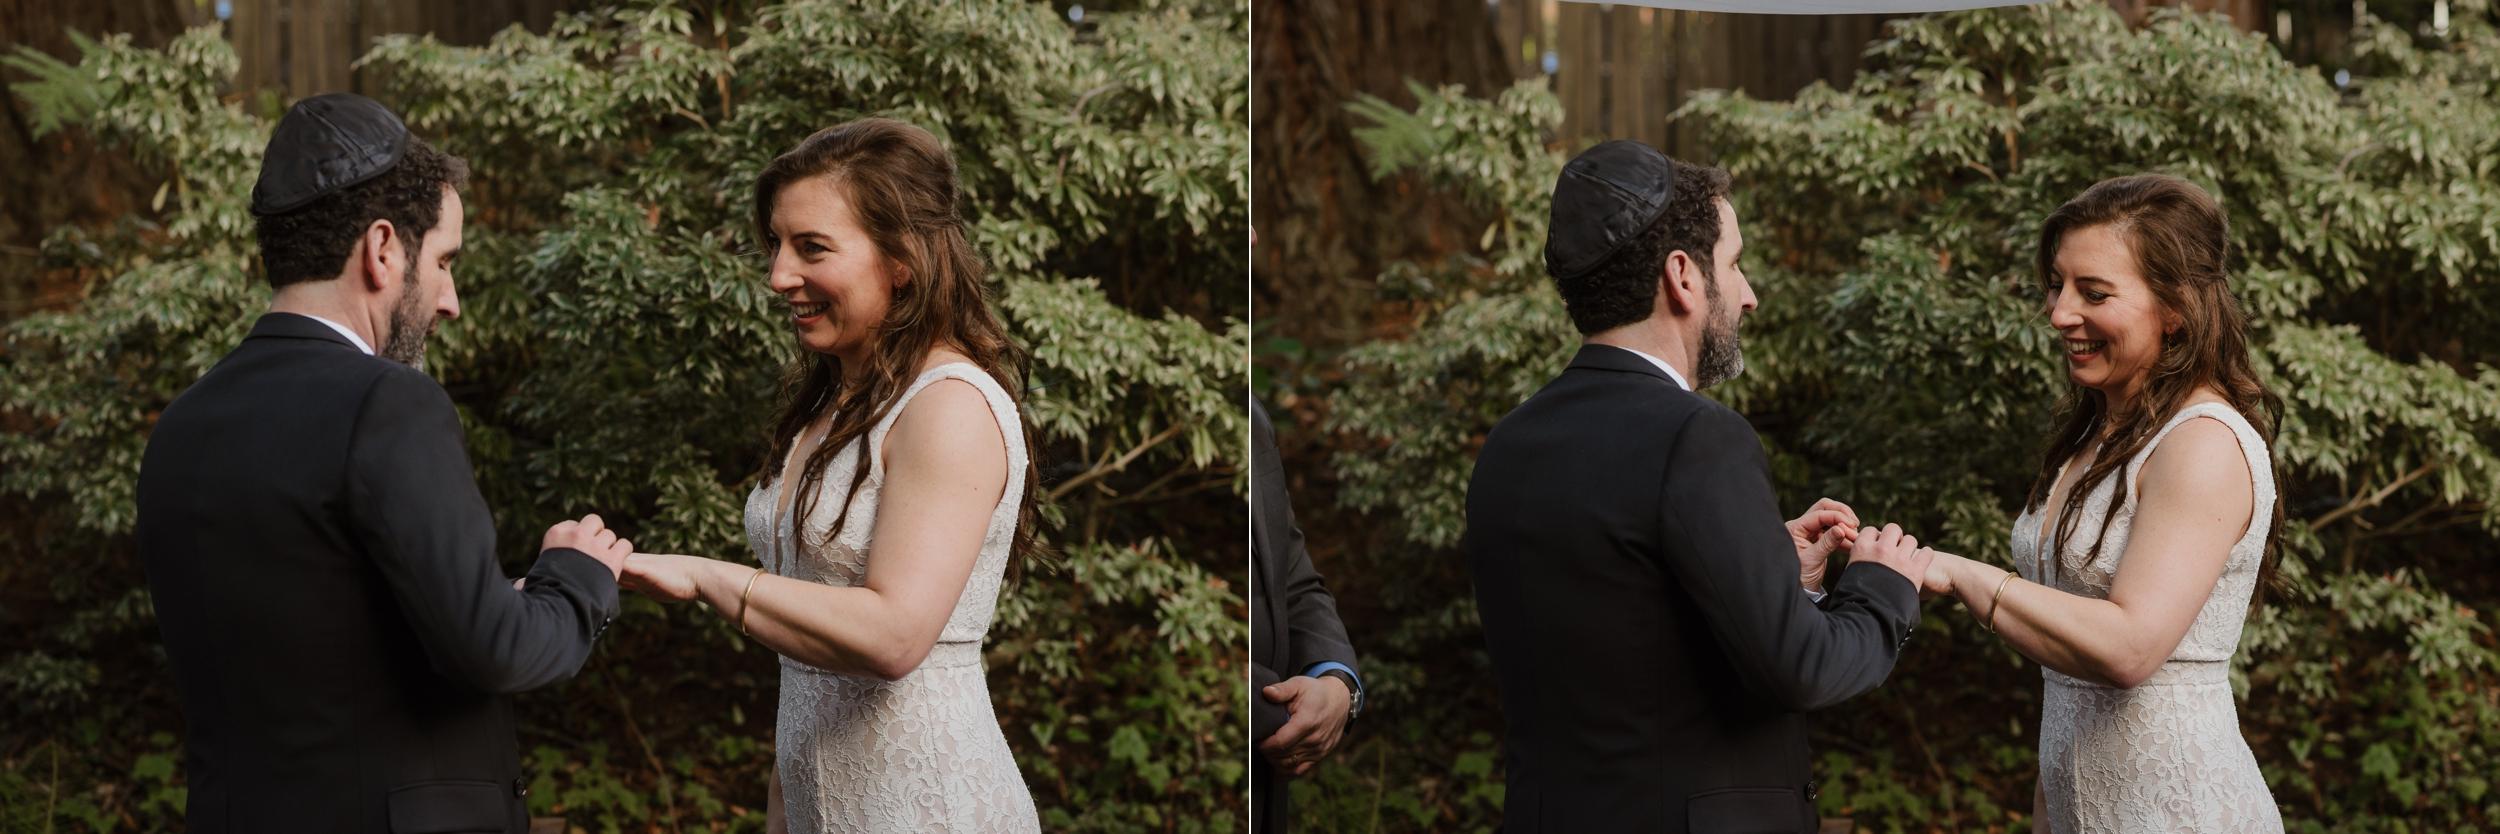 041winter-mill-valley-wedding-outdoor-art-club-wedding-vivianchen-205_WEB.jpg